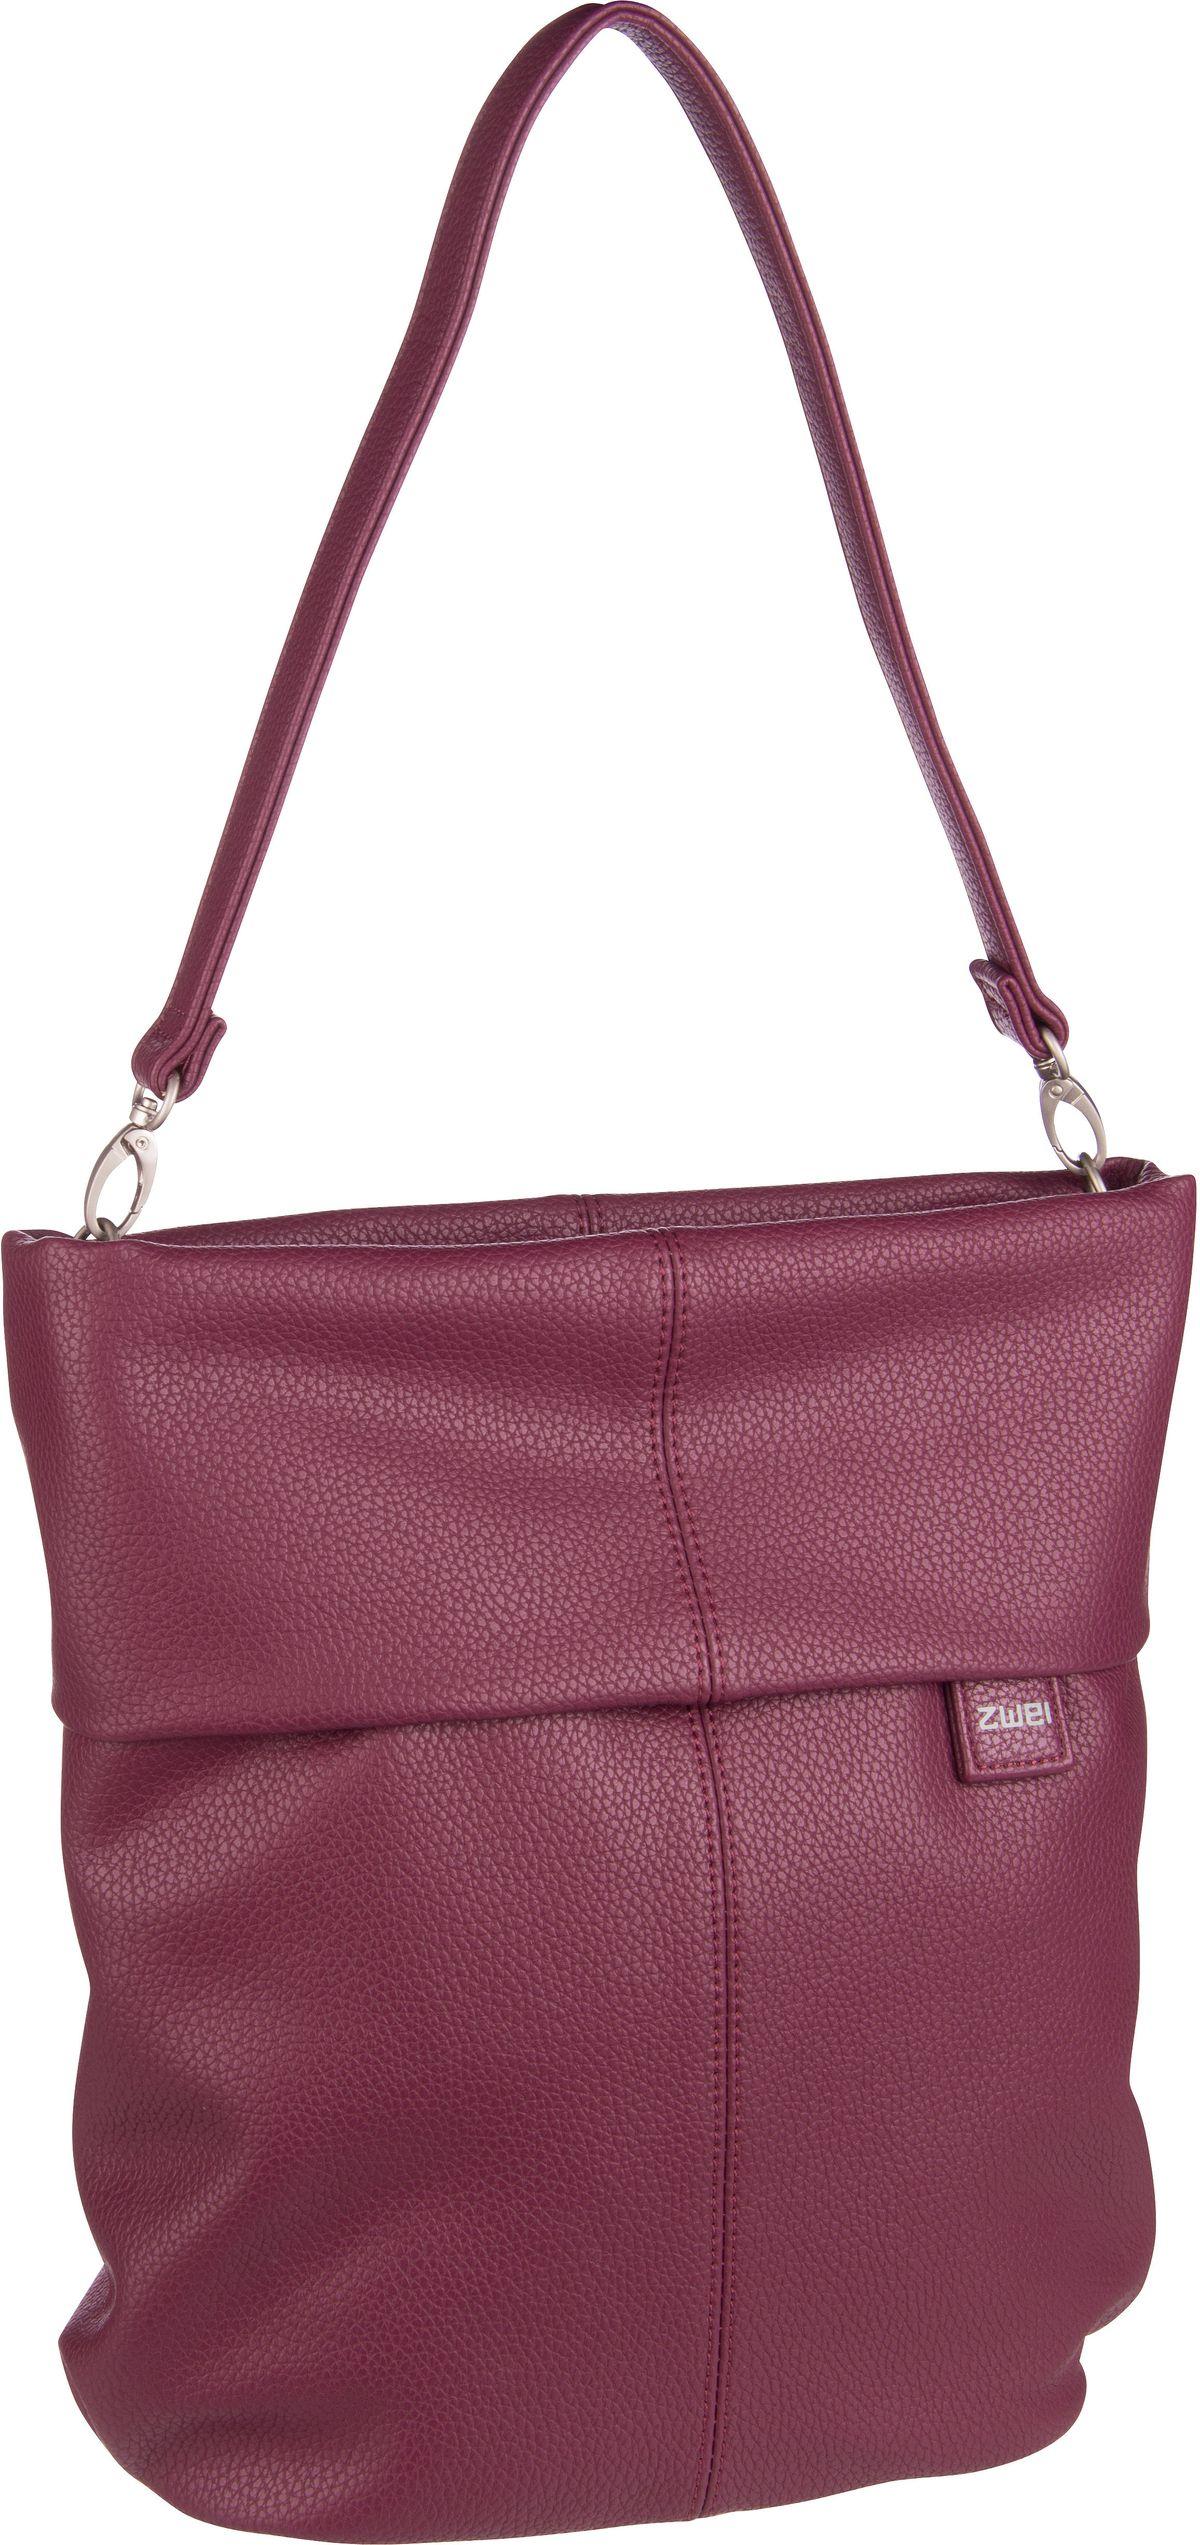 Handtasche Mademoiselle M12 Bordeaux (7 Liter)